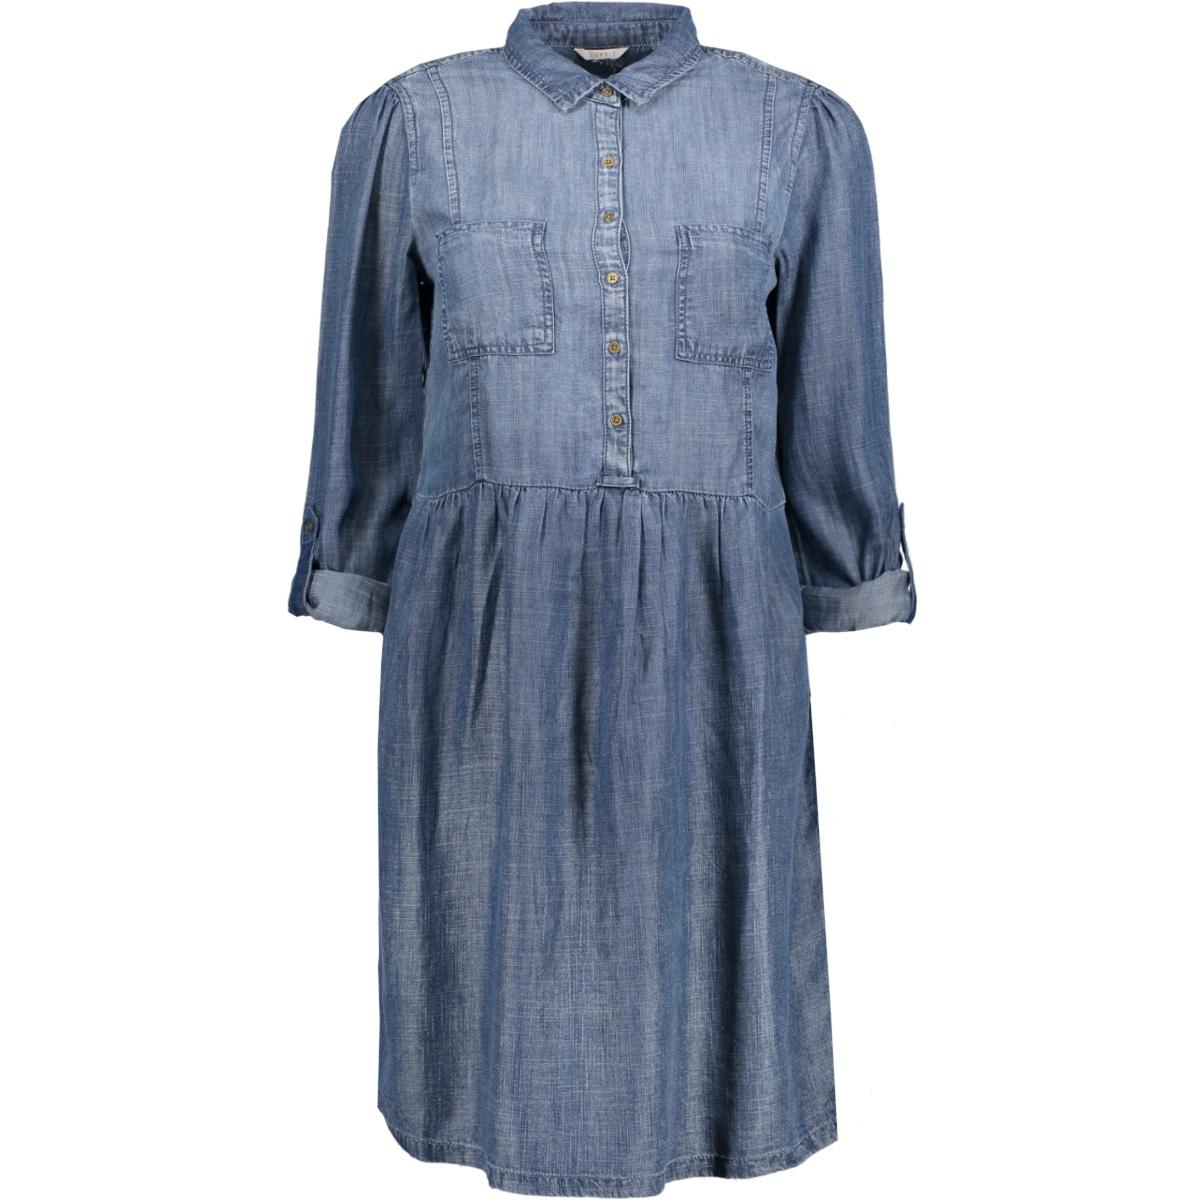 087ee1e016 esprit jurk e430